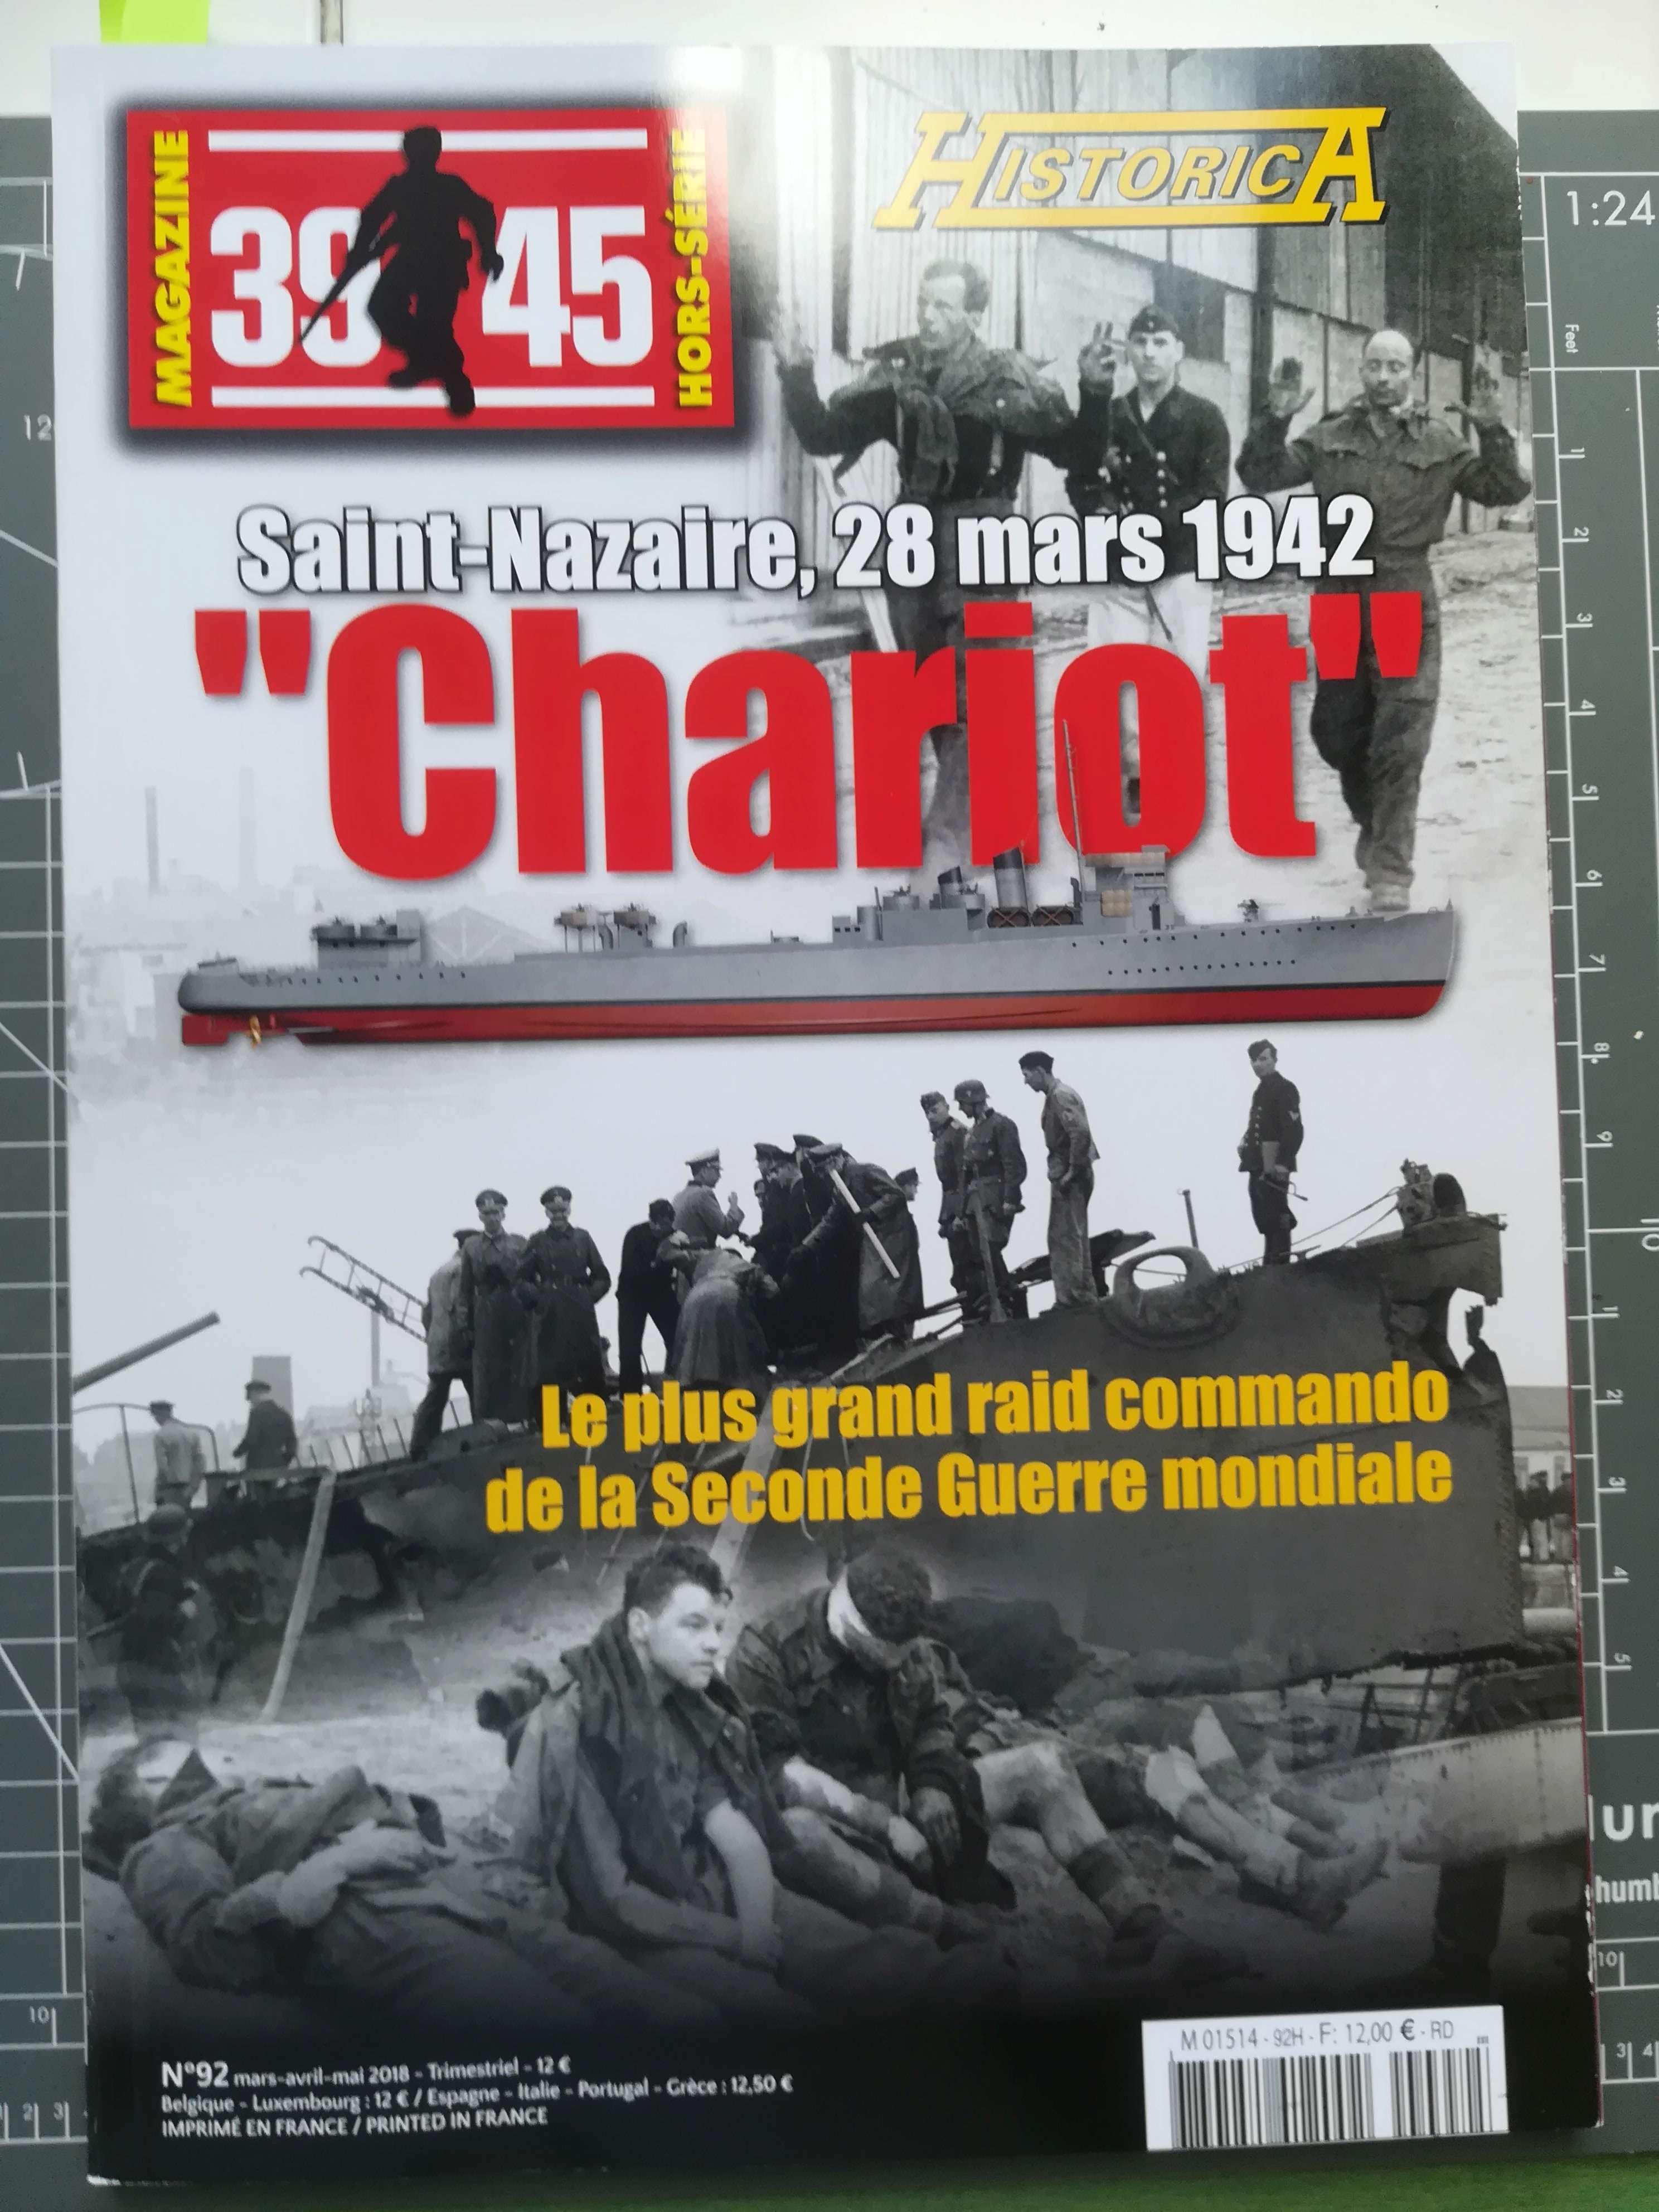 "Opération ""Chariot"" - Saint Nazaire 28 mars 1942 (Vosper MTB 74 - Italeri 1/35) Img_1564"